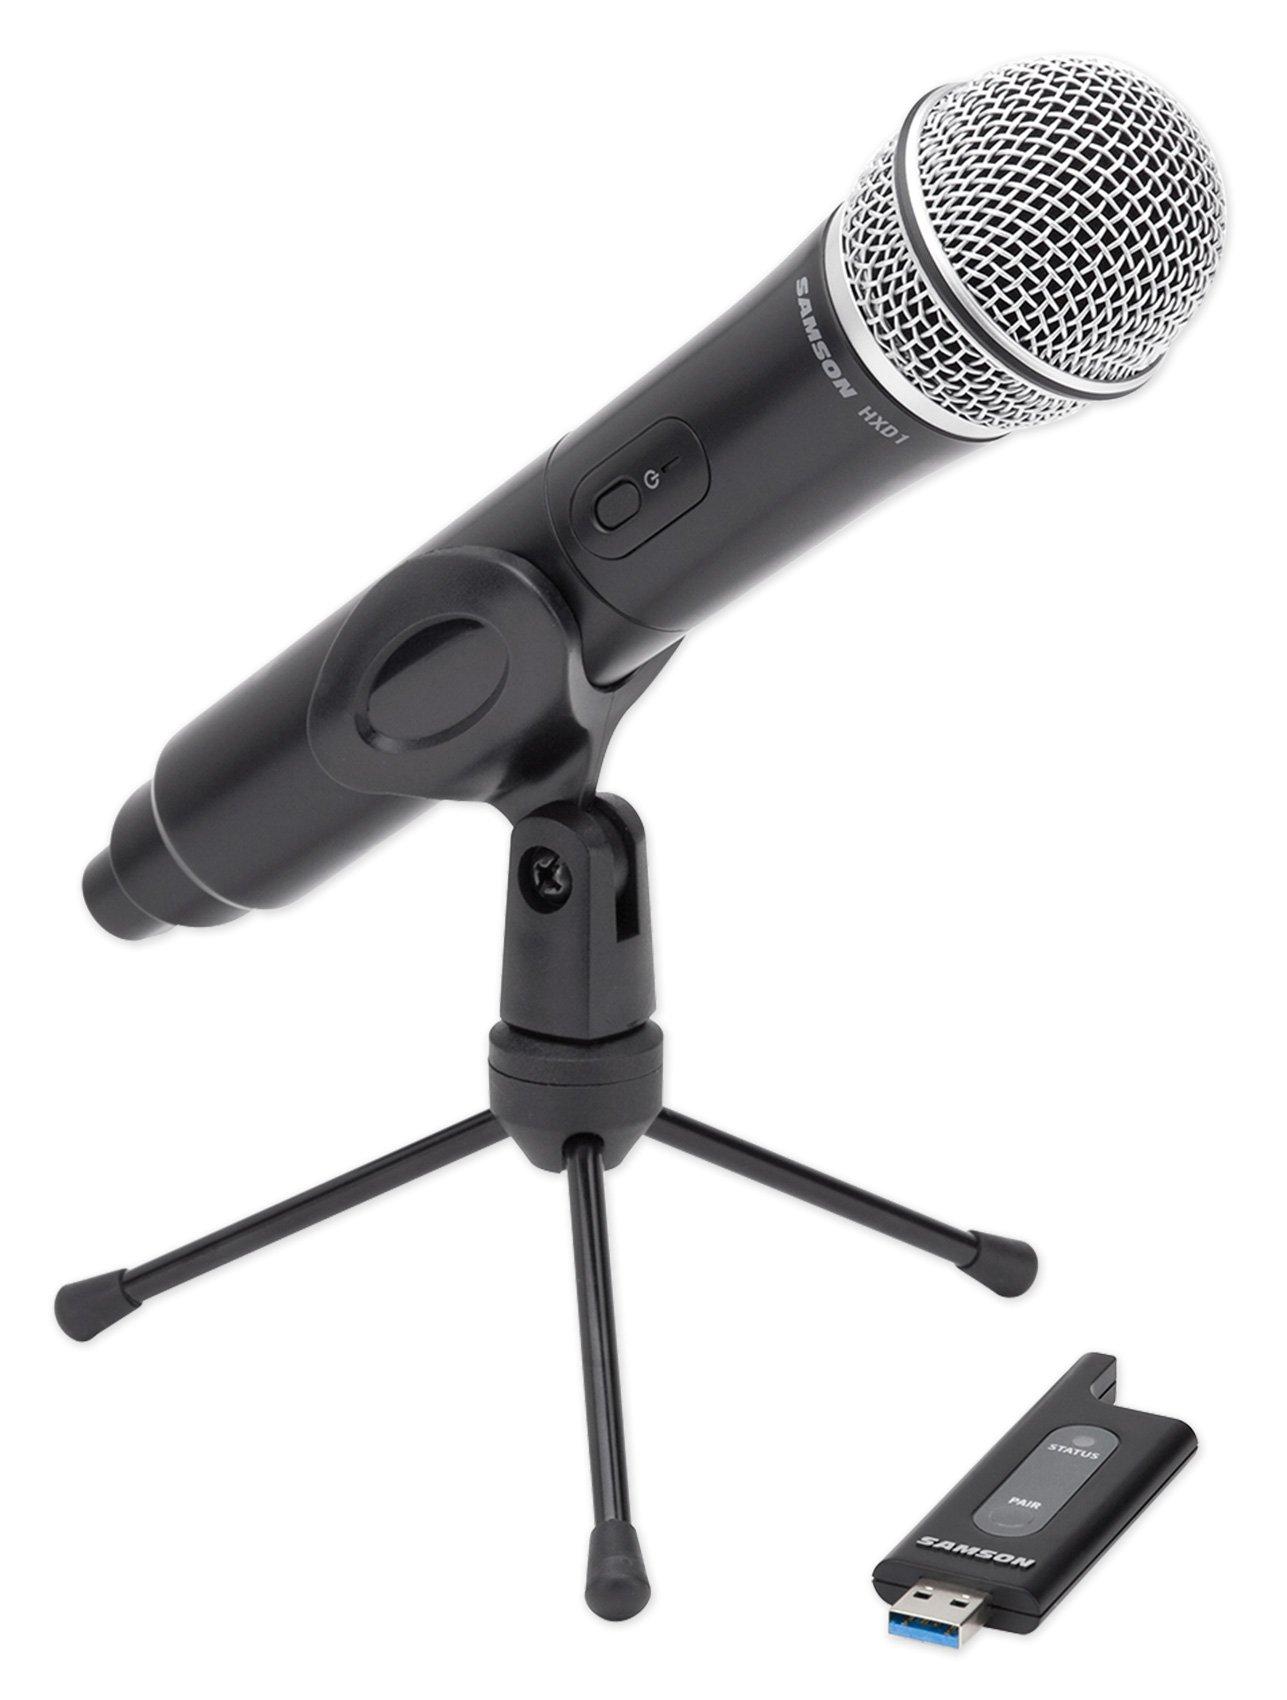 SAMSON Stage X1U Handheld USB Wireless Podcast Podcasting Microphone+Desk Stand